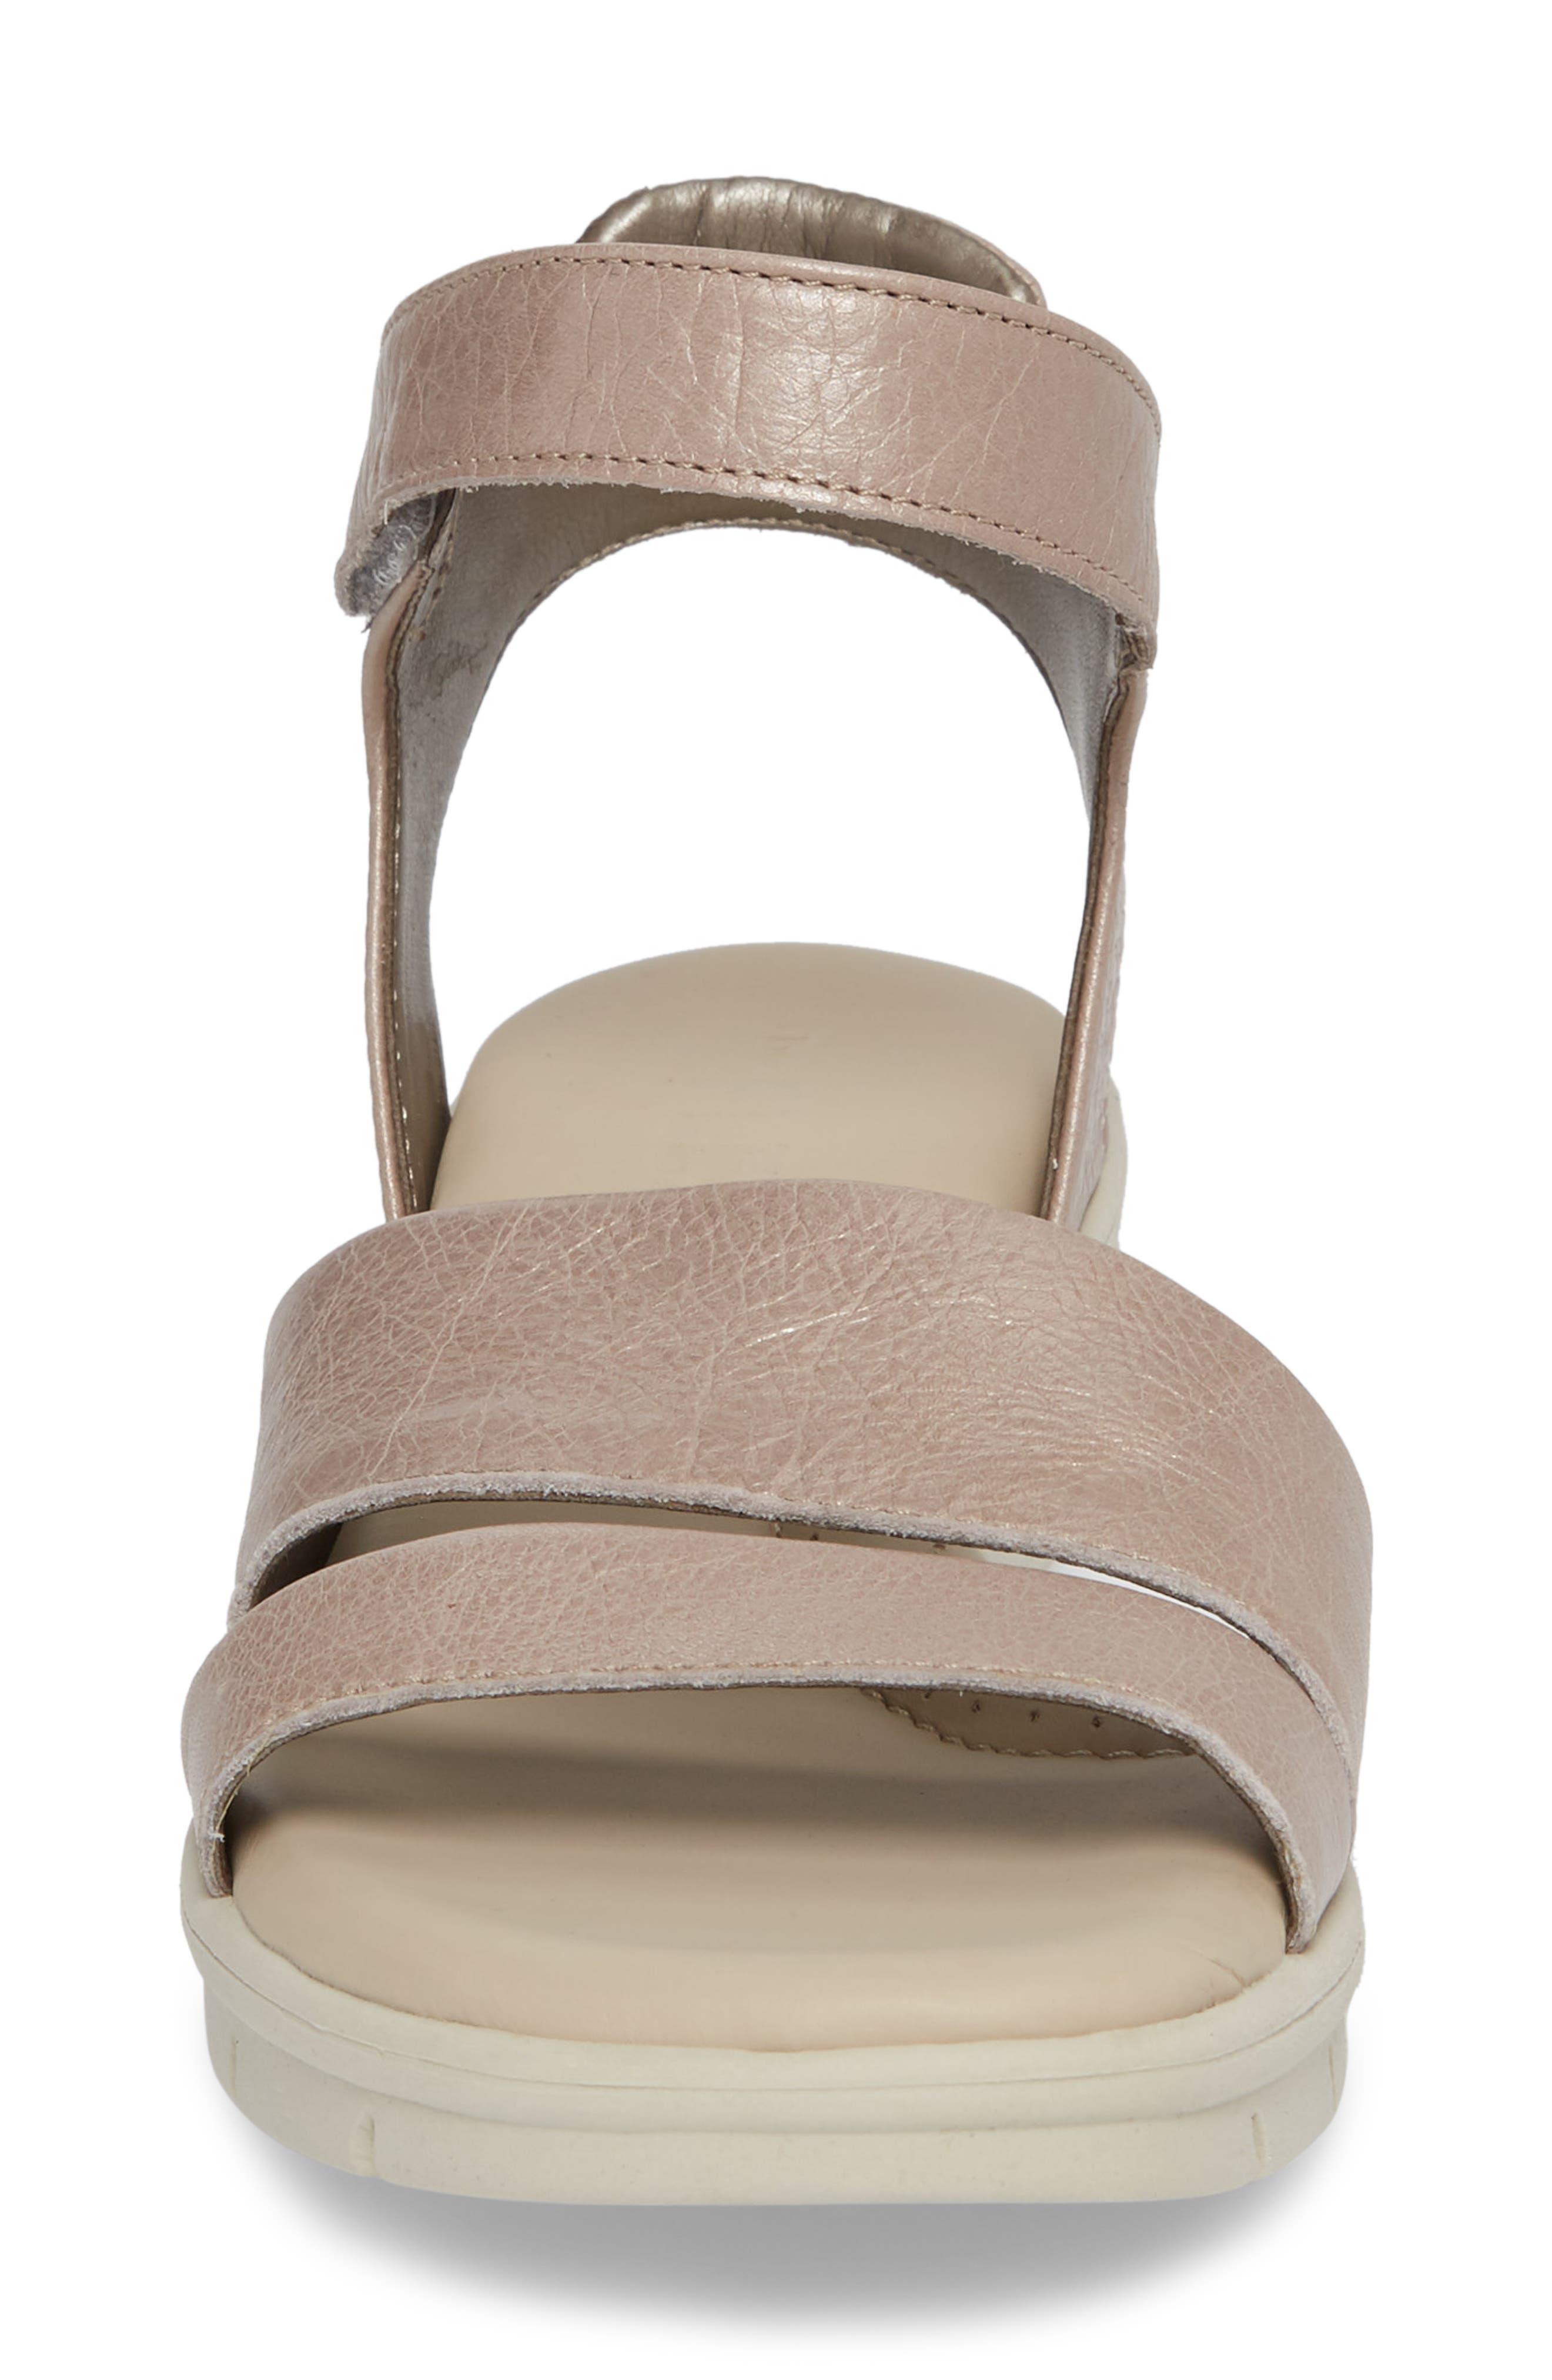 Crossover Ankle Strap Sandal,                             Alternate thumbnail 4, color,                             HAZE CRACKLED LEATHER